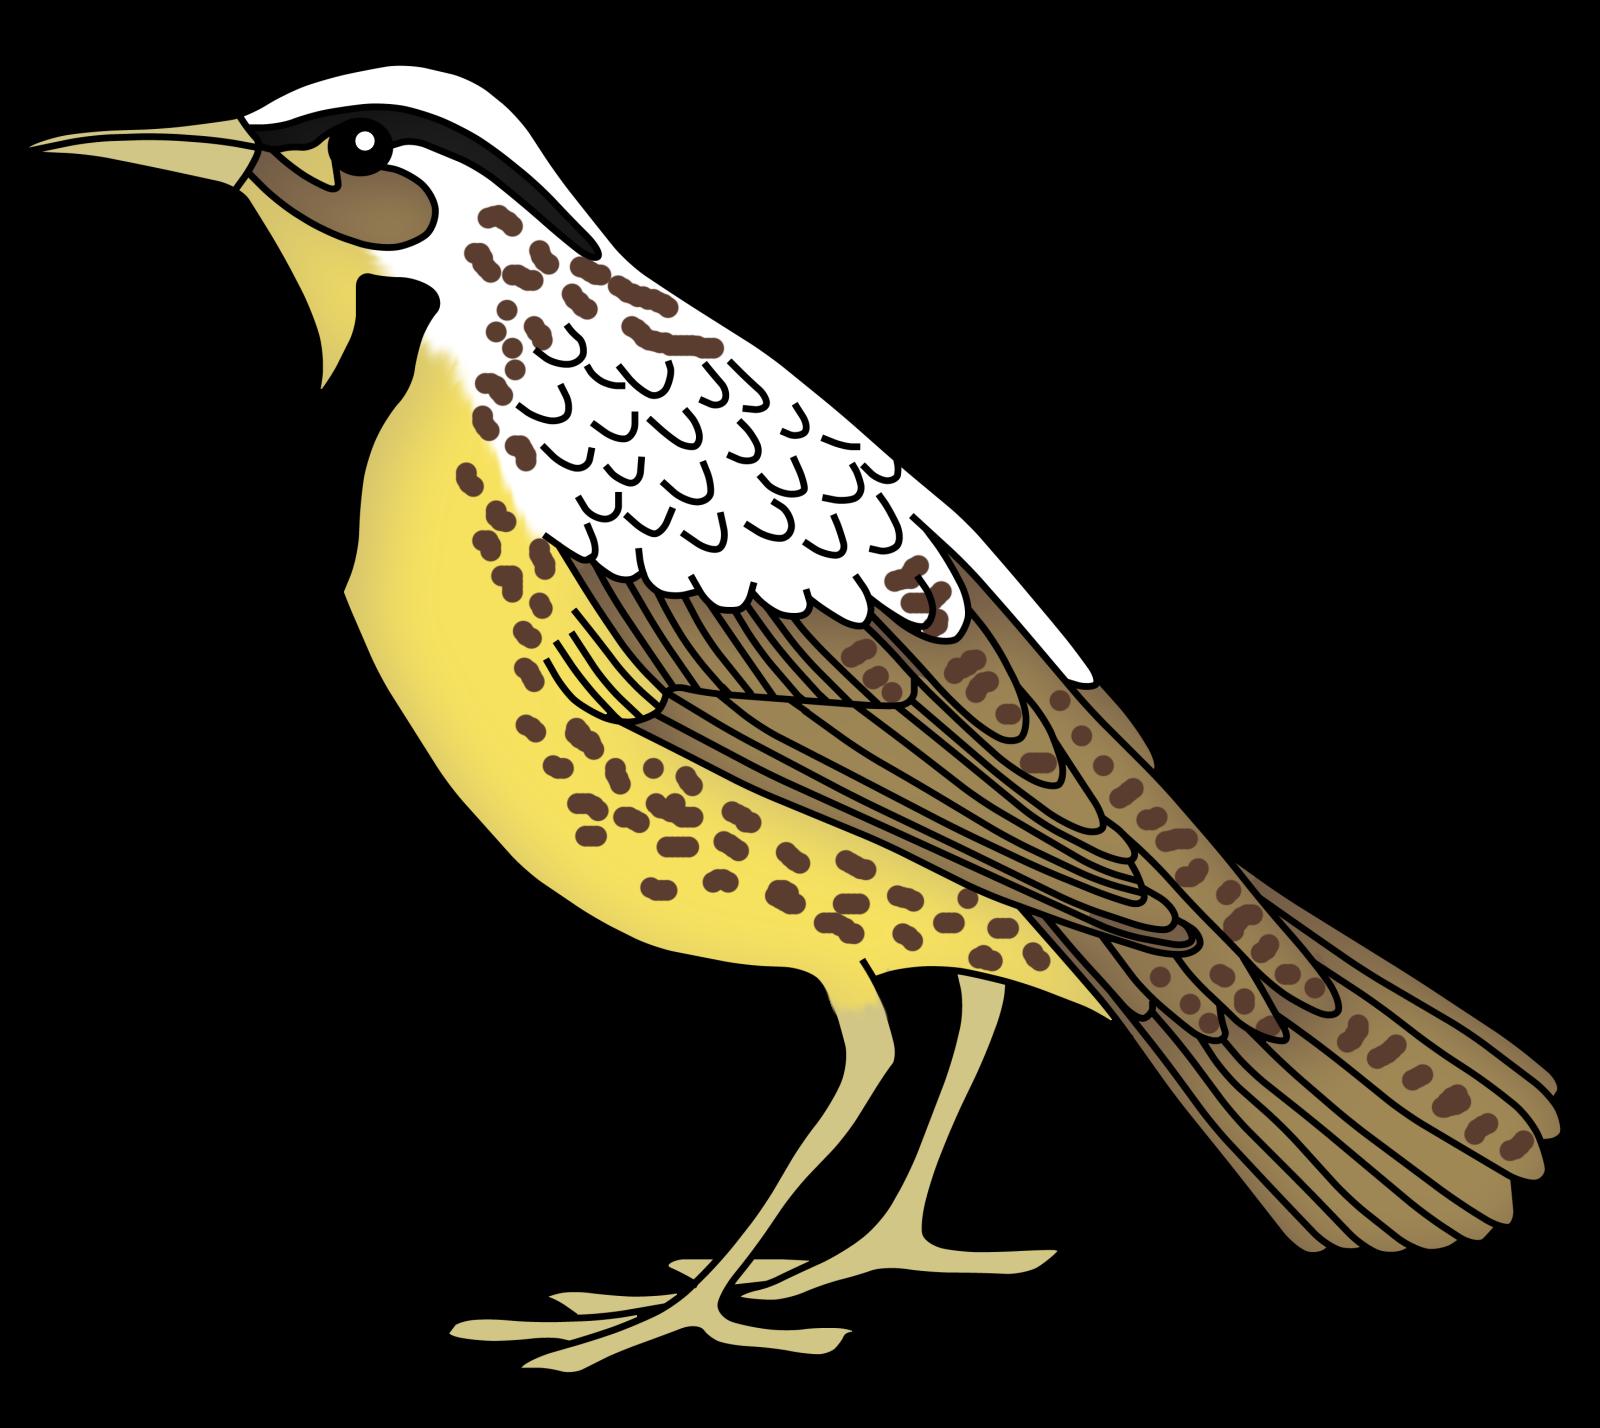 Clipground teacher treasure hunter. Clipart birds meadowlark